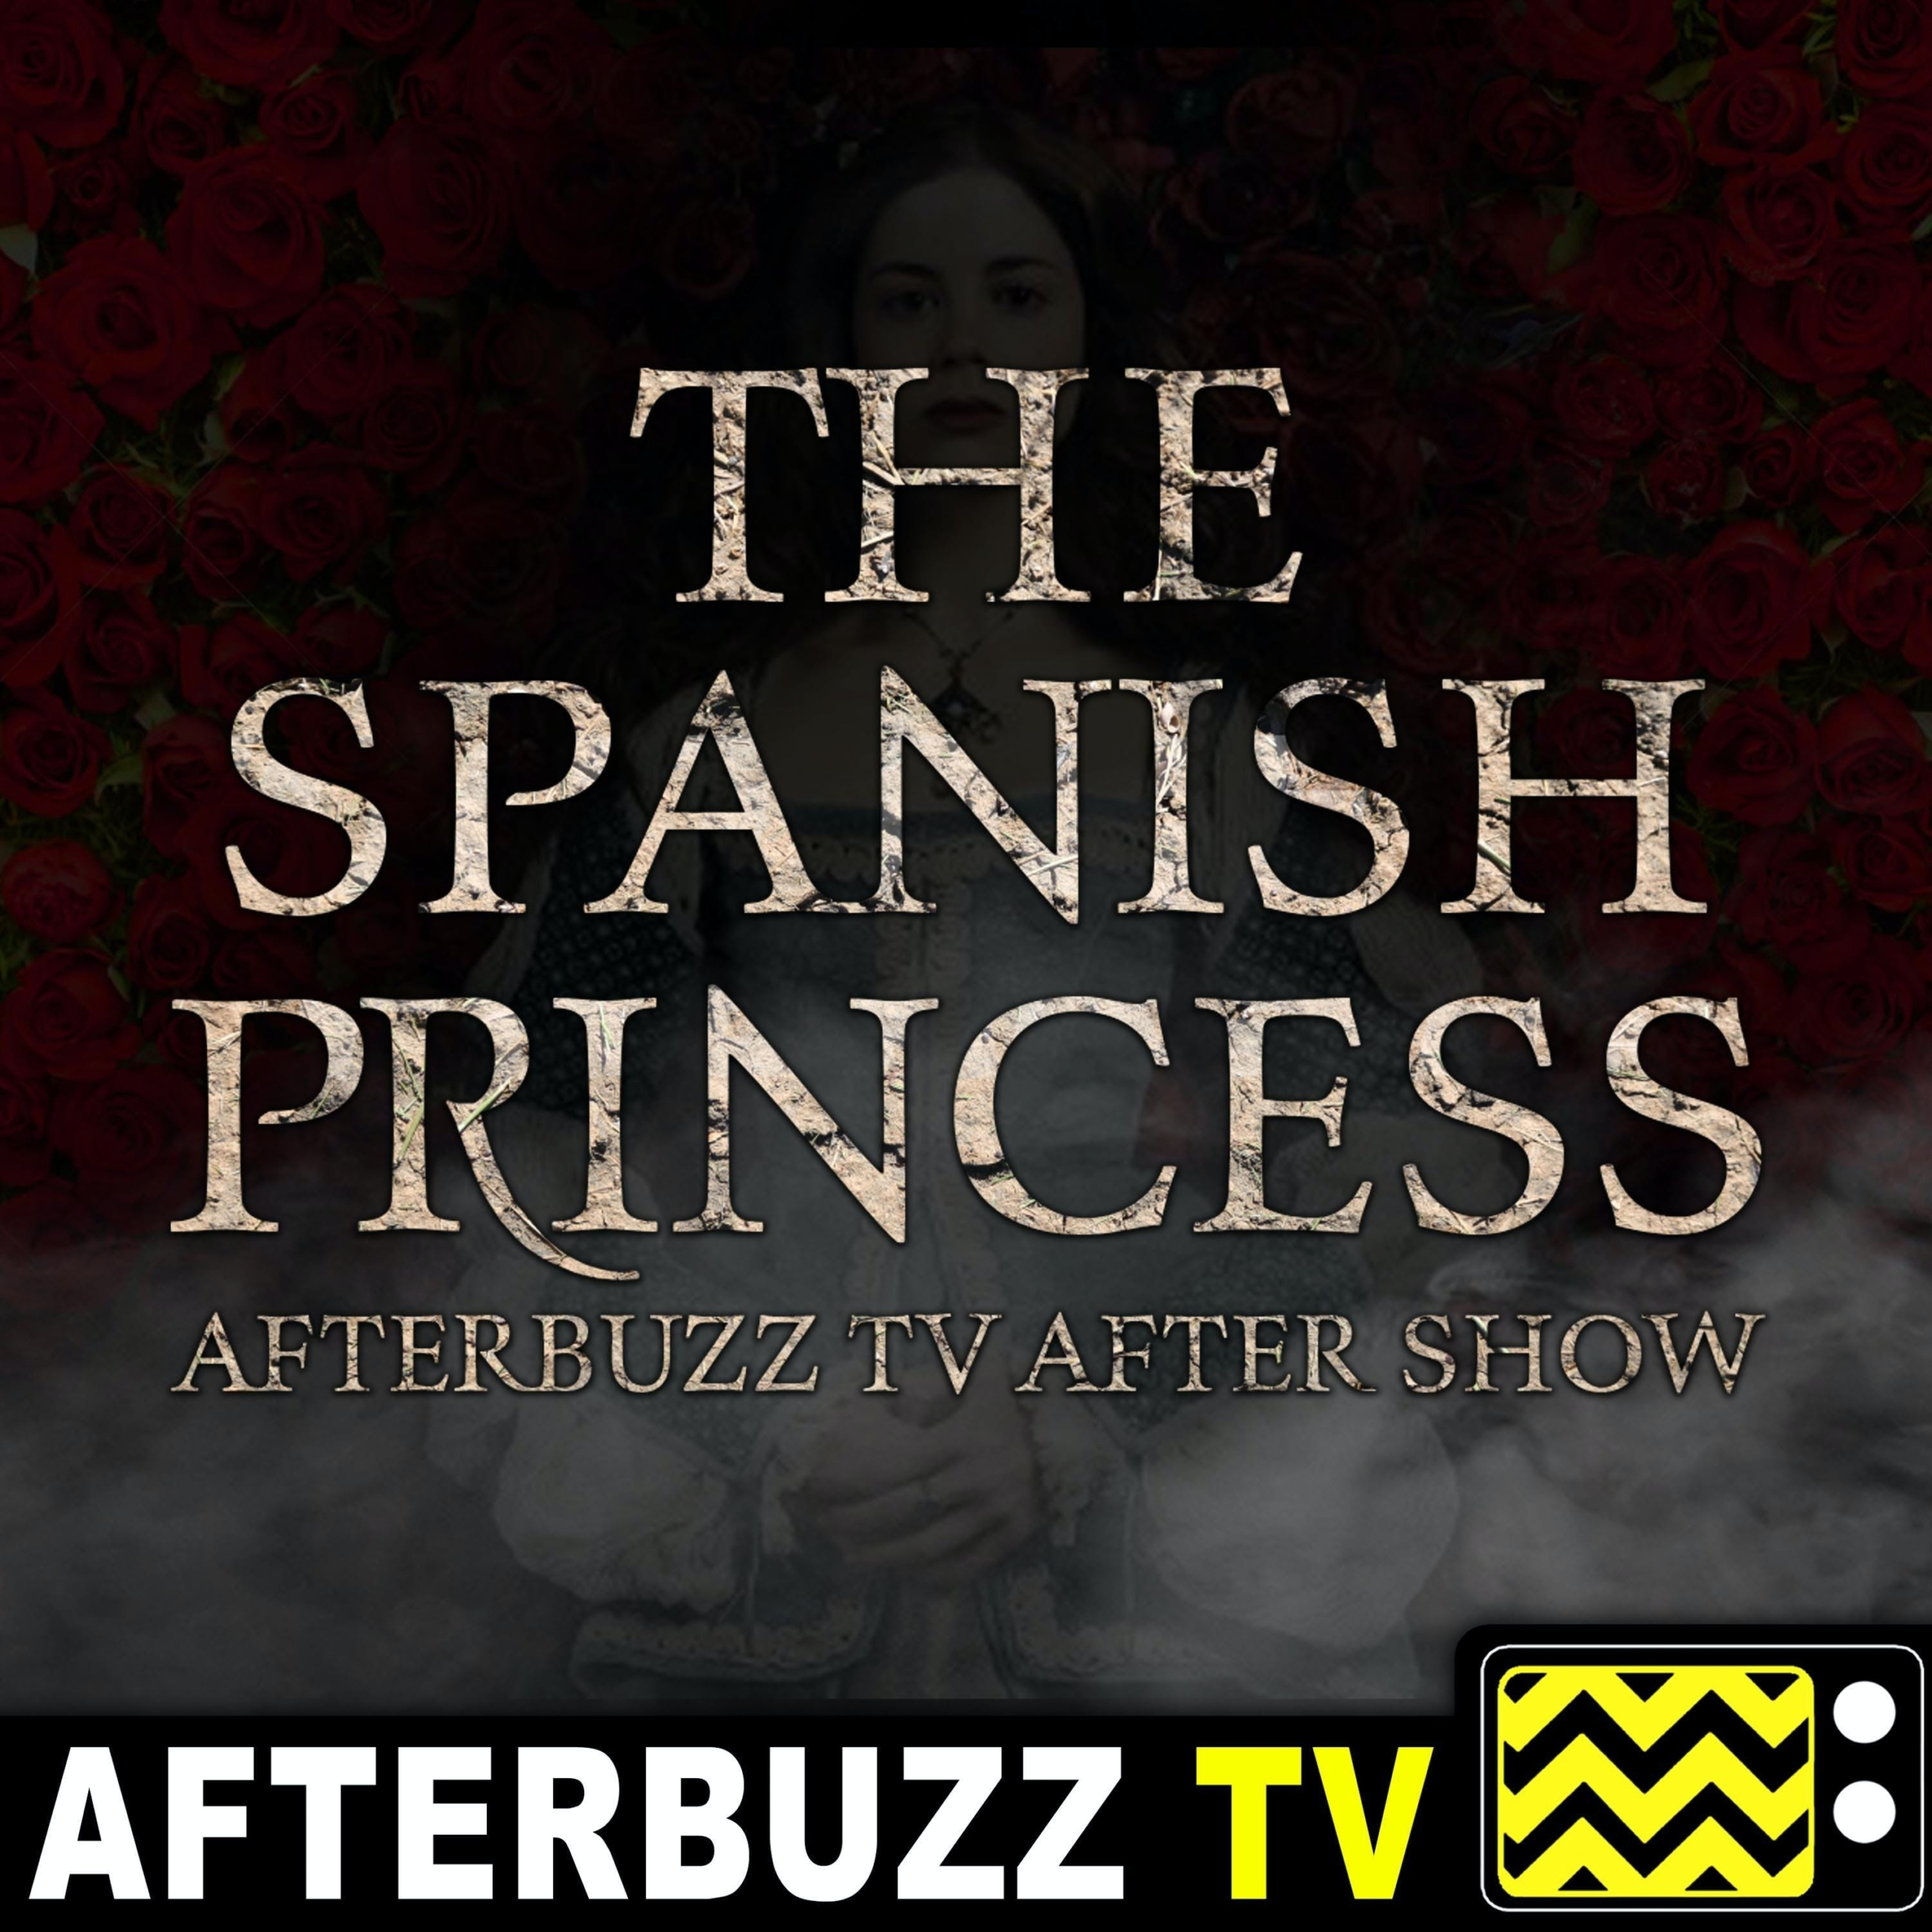 The Spanish Princess Podcast